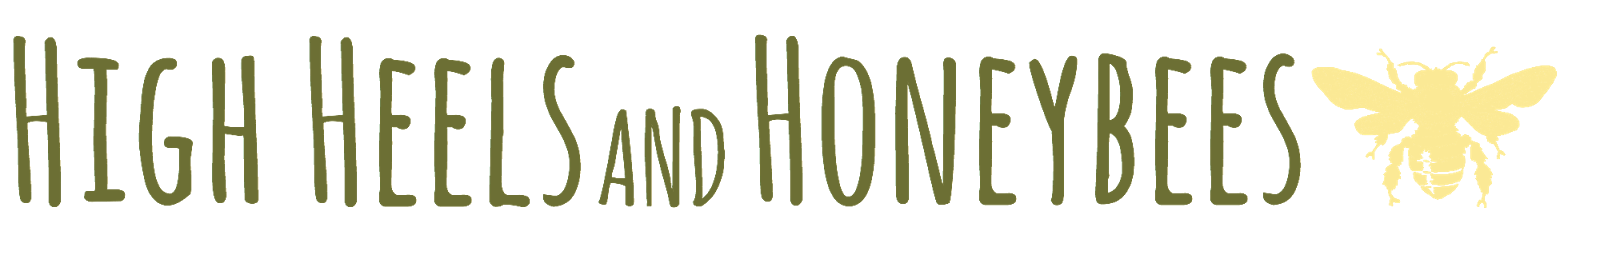 High Heels and Honeybees